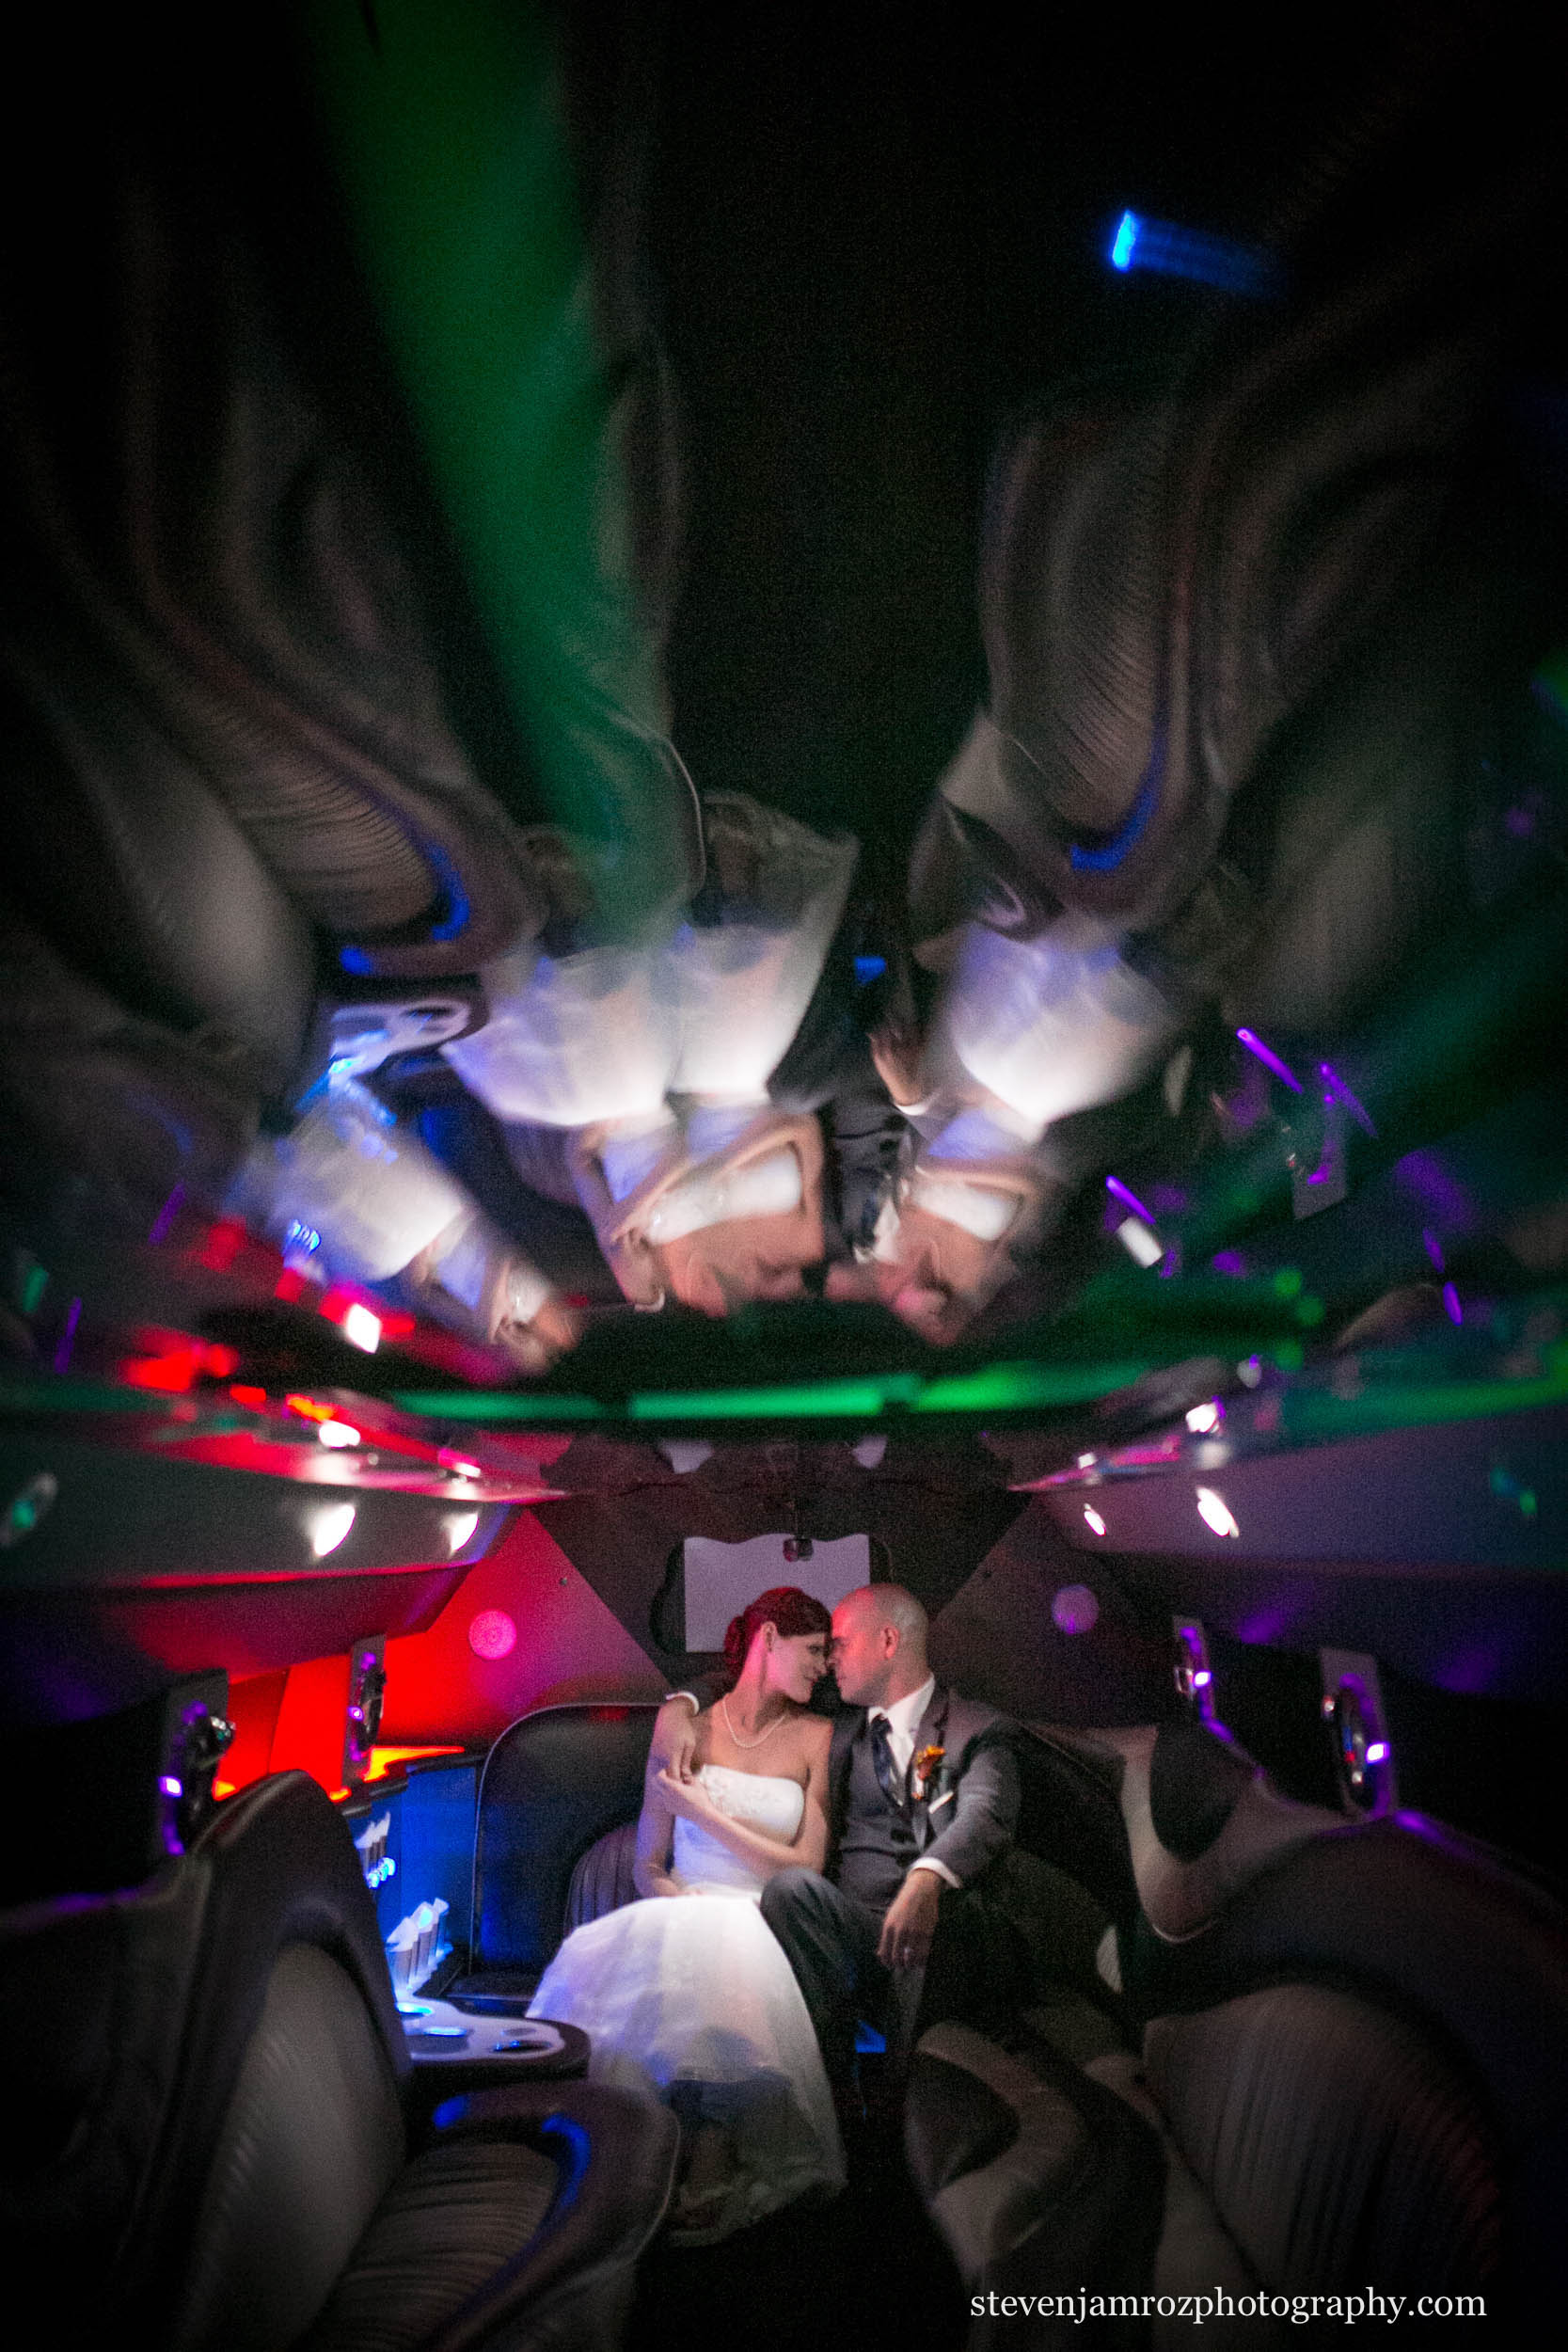 limo-lights-hudson-manor-steven-jamroz-photography-0341.jpg